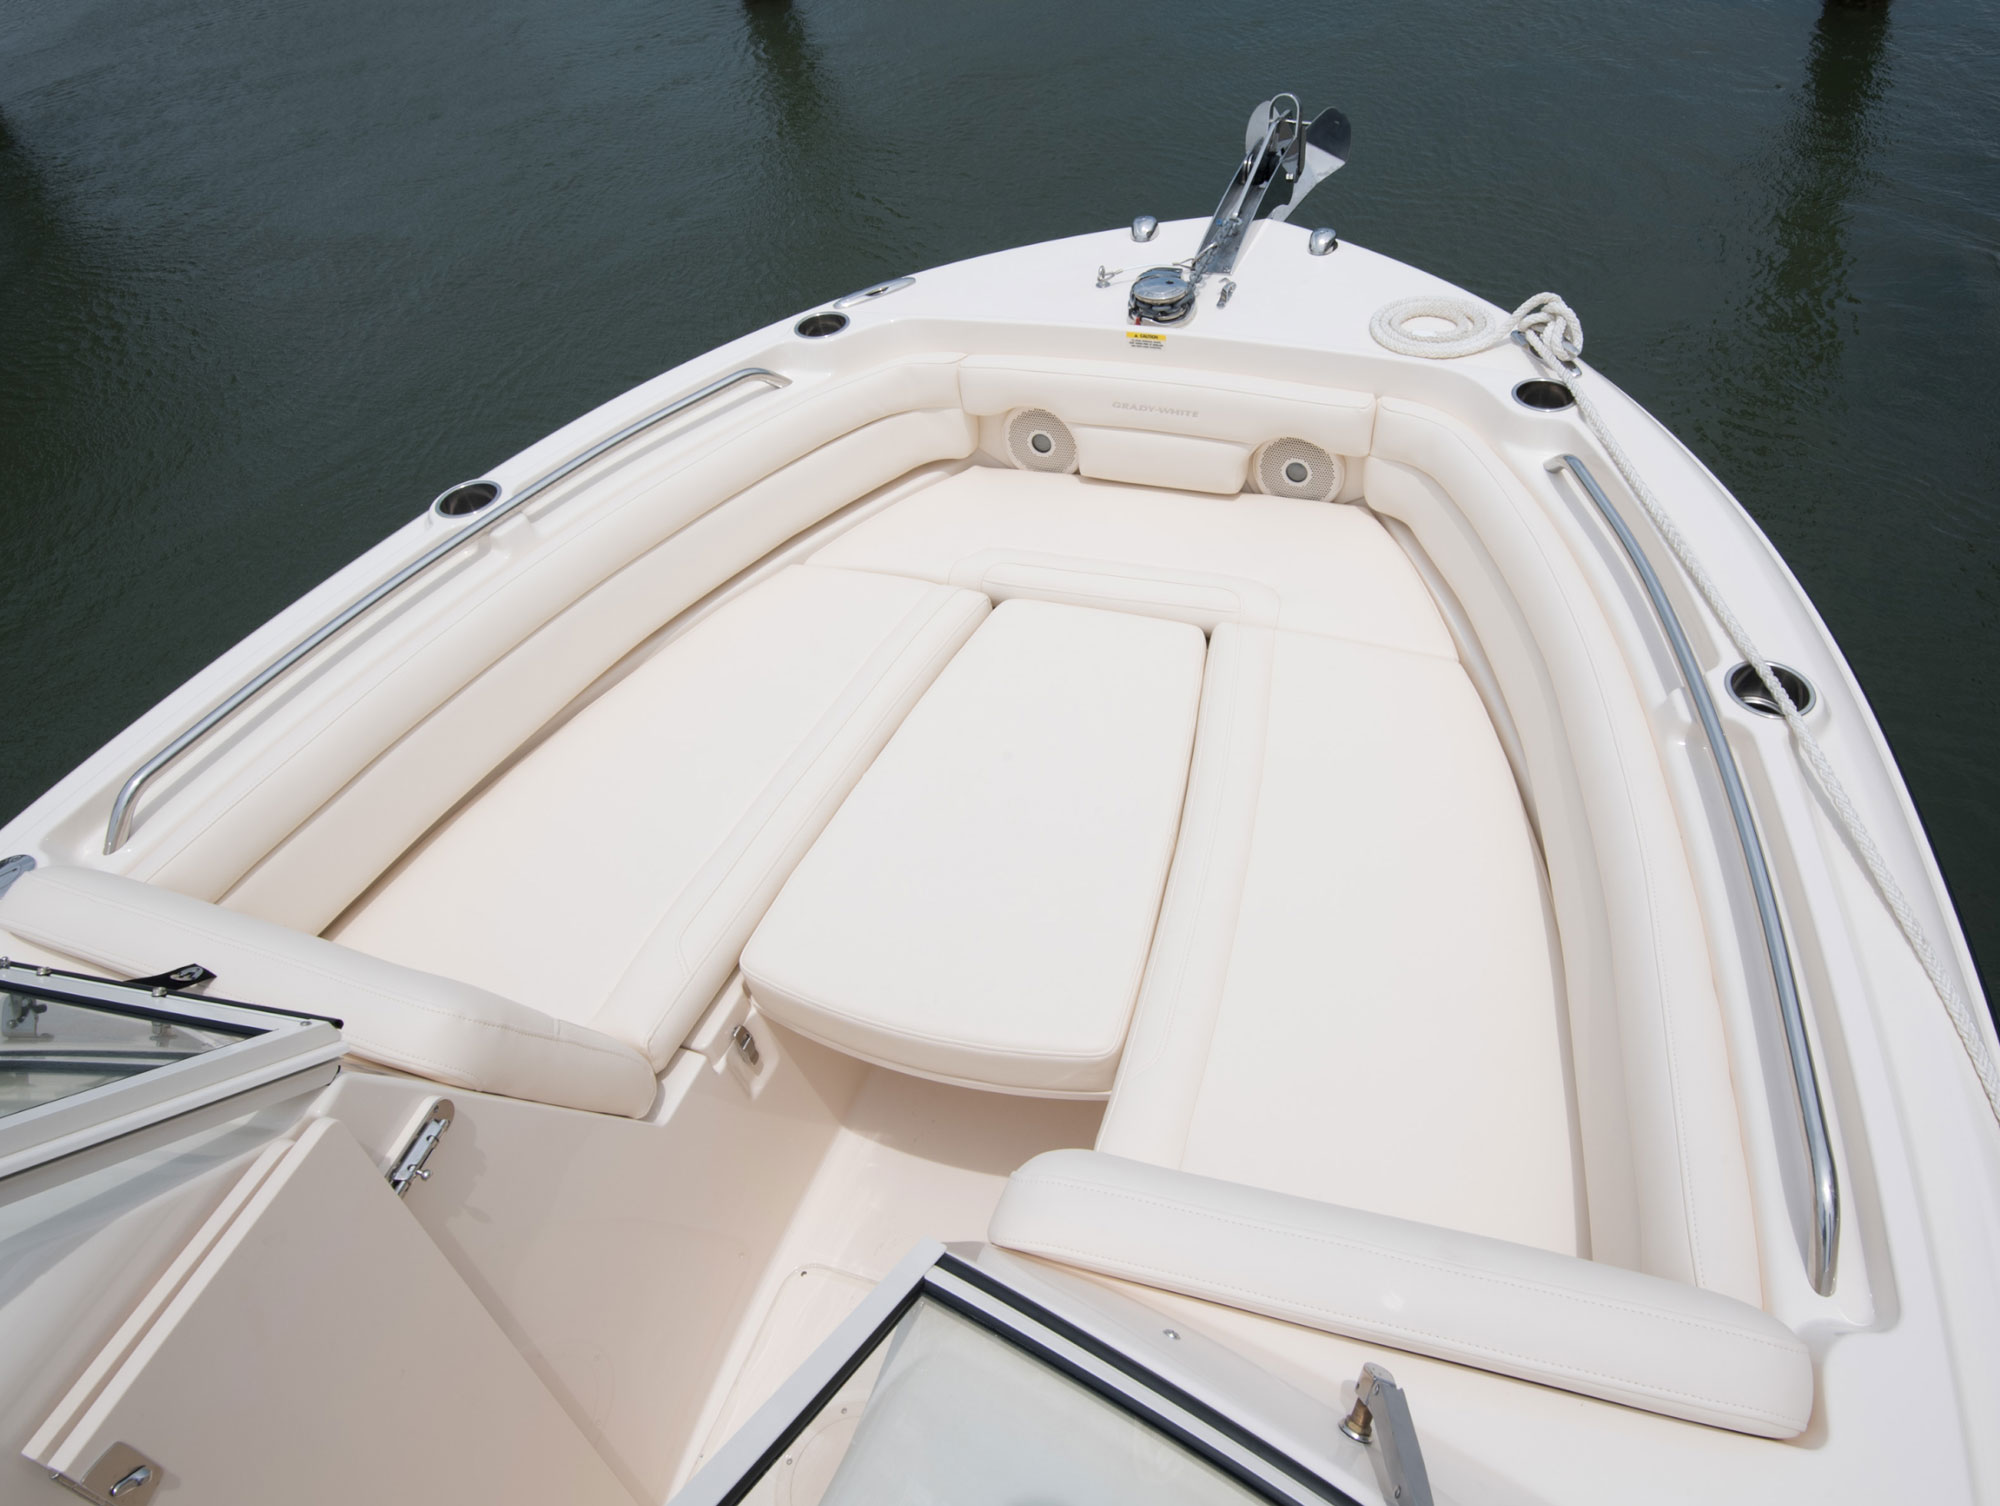 Grady-White Freedom 235 23-foot dual console sun platform